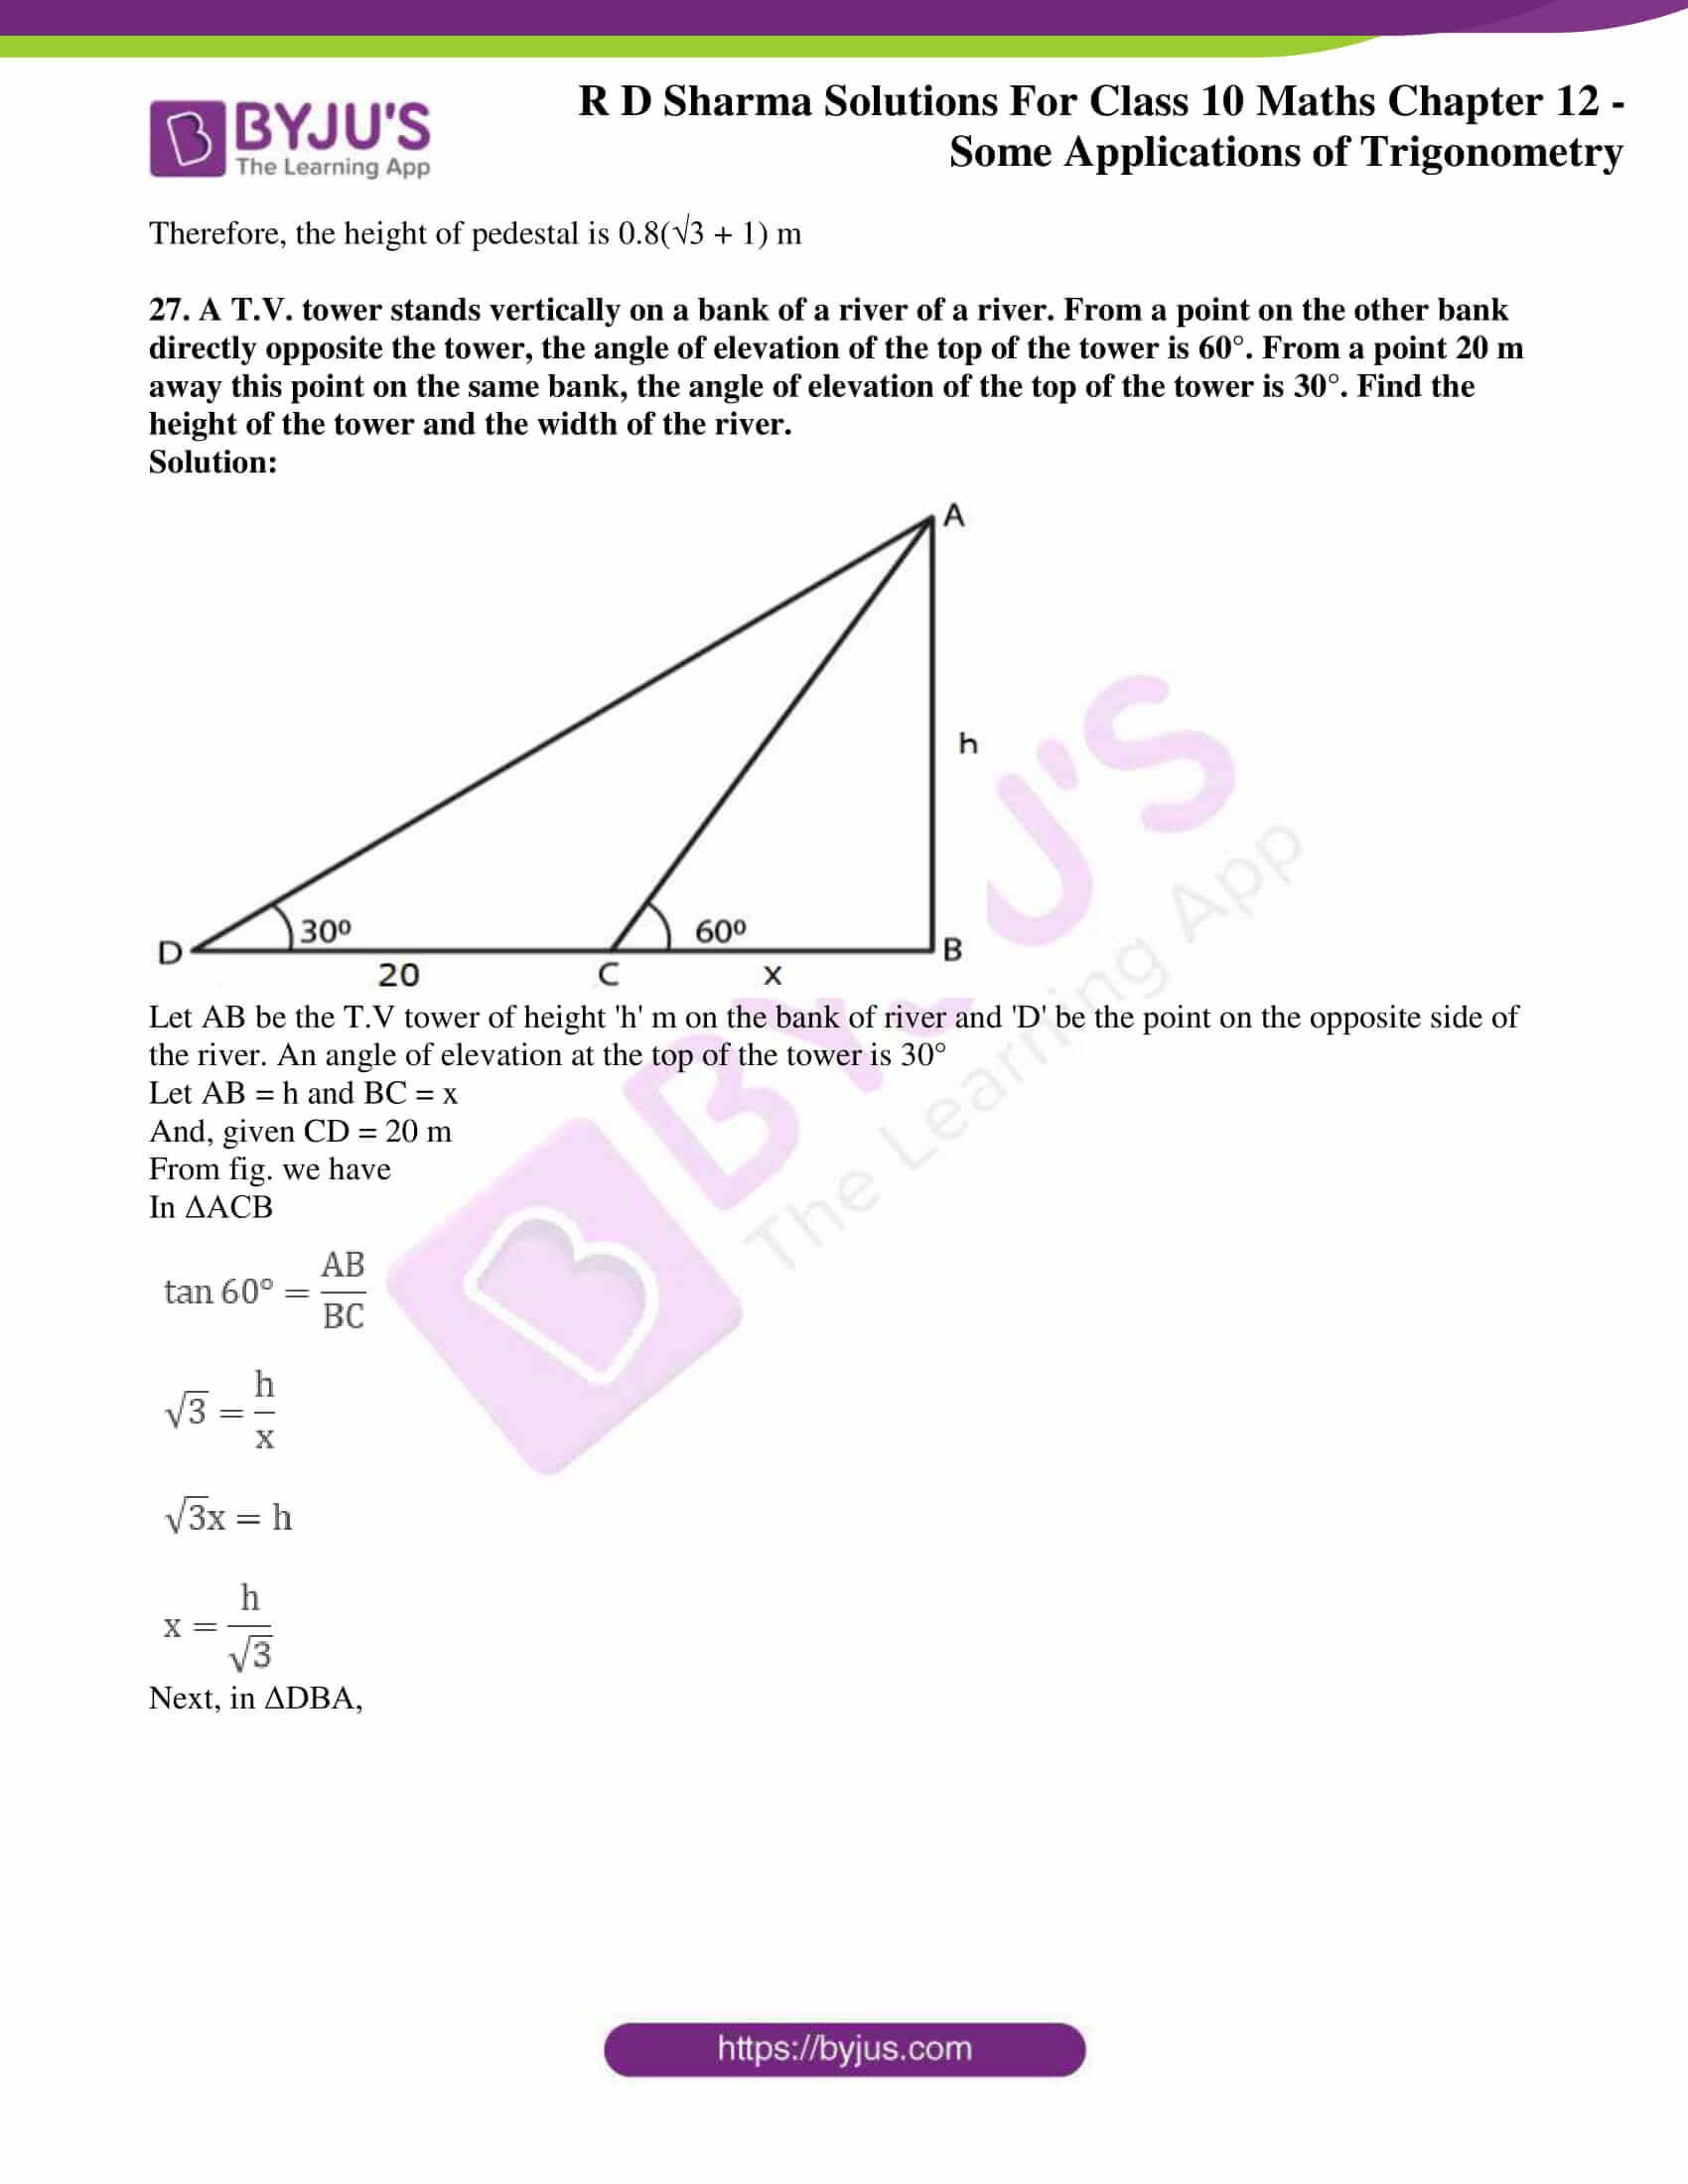 rd sharma class 10 chapter 12 applications trigonometry solutions 26